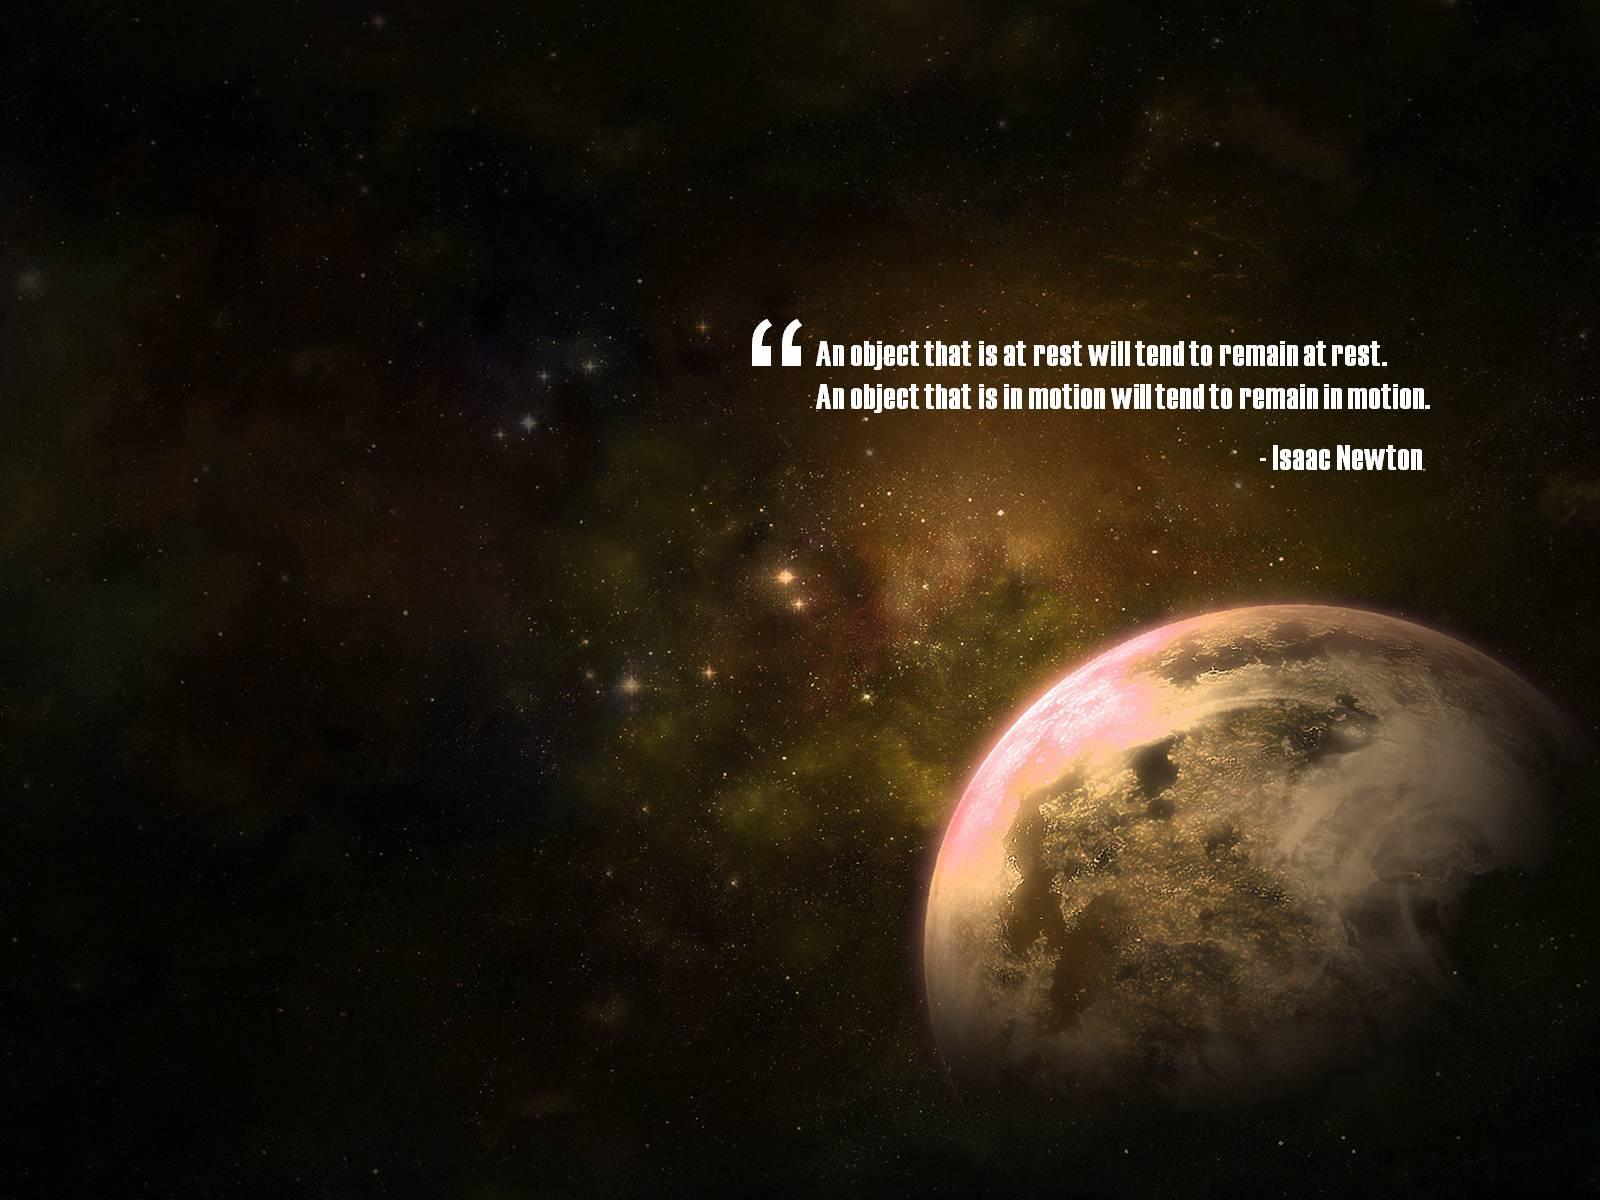 quotes motivational quotes motivational quotes motivational quotes 1600x1200